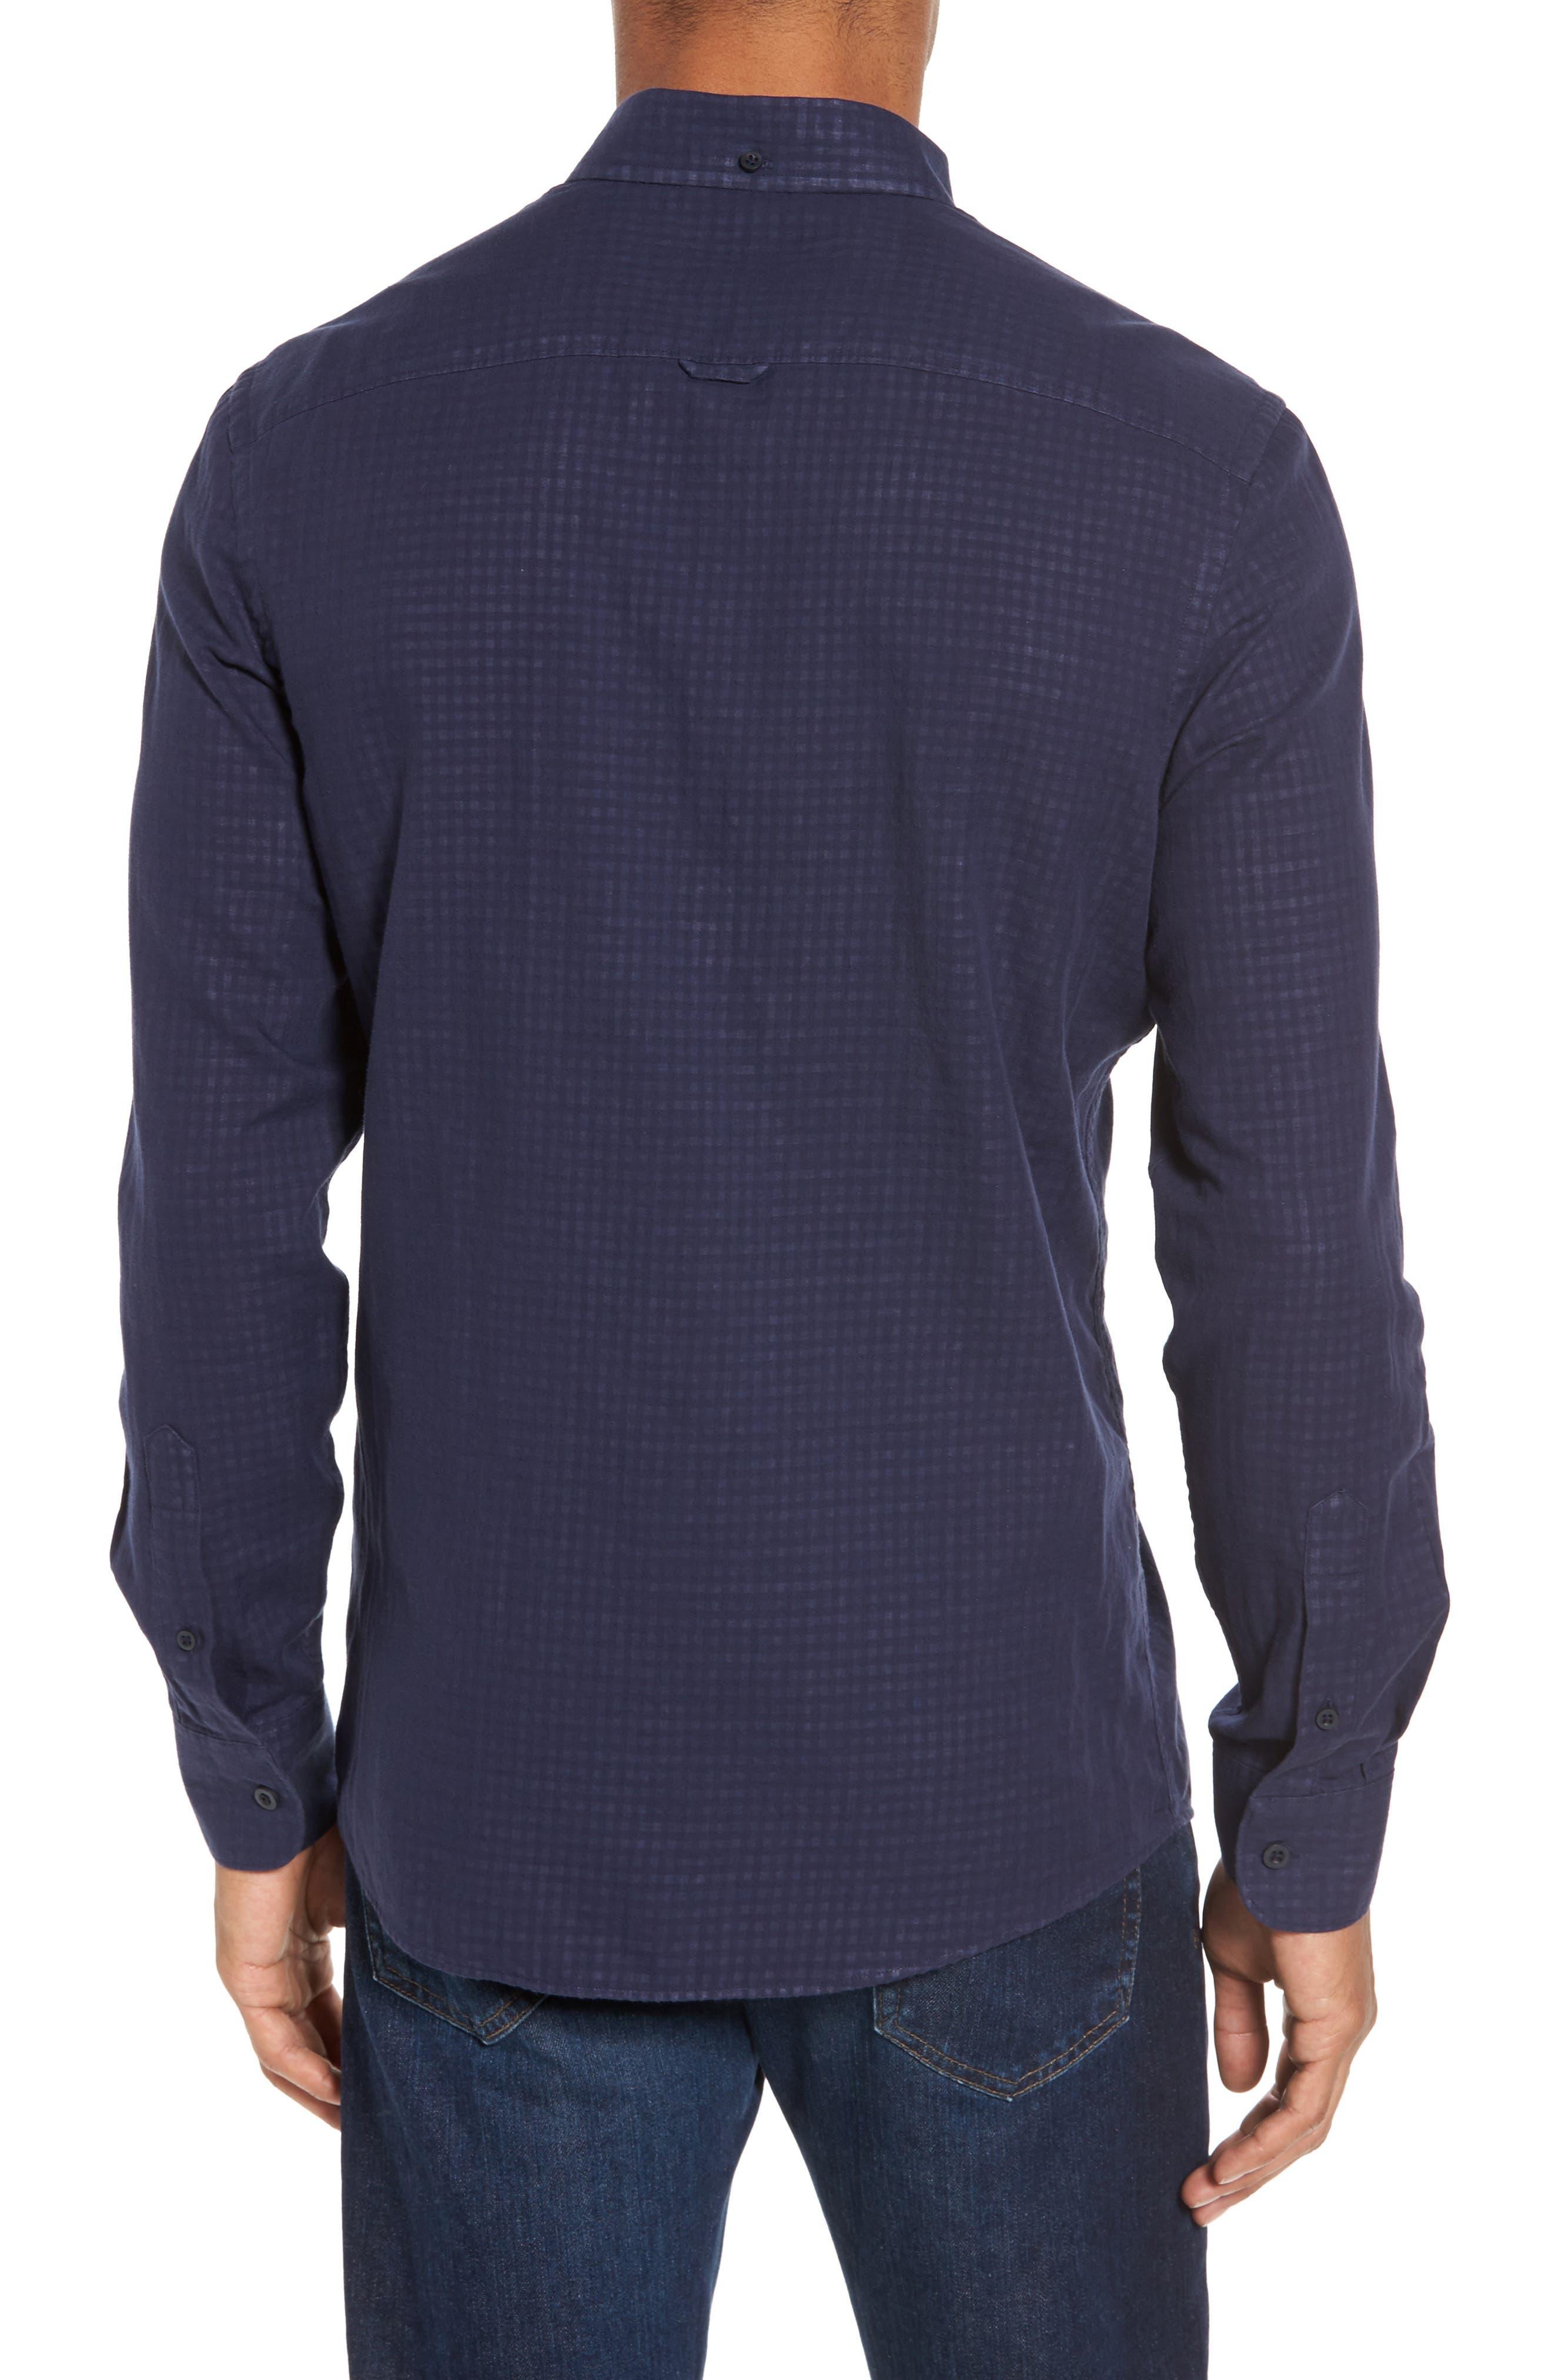 Trim Fit Duofold Sport Shirt,                             Alternate thumbnail 2, color,                             Navy Iris Gingham Duofold